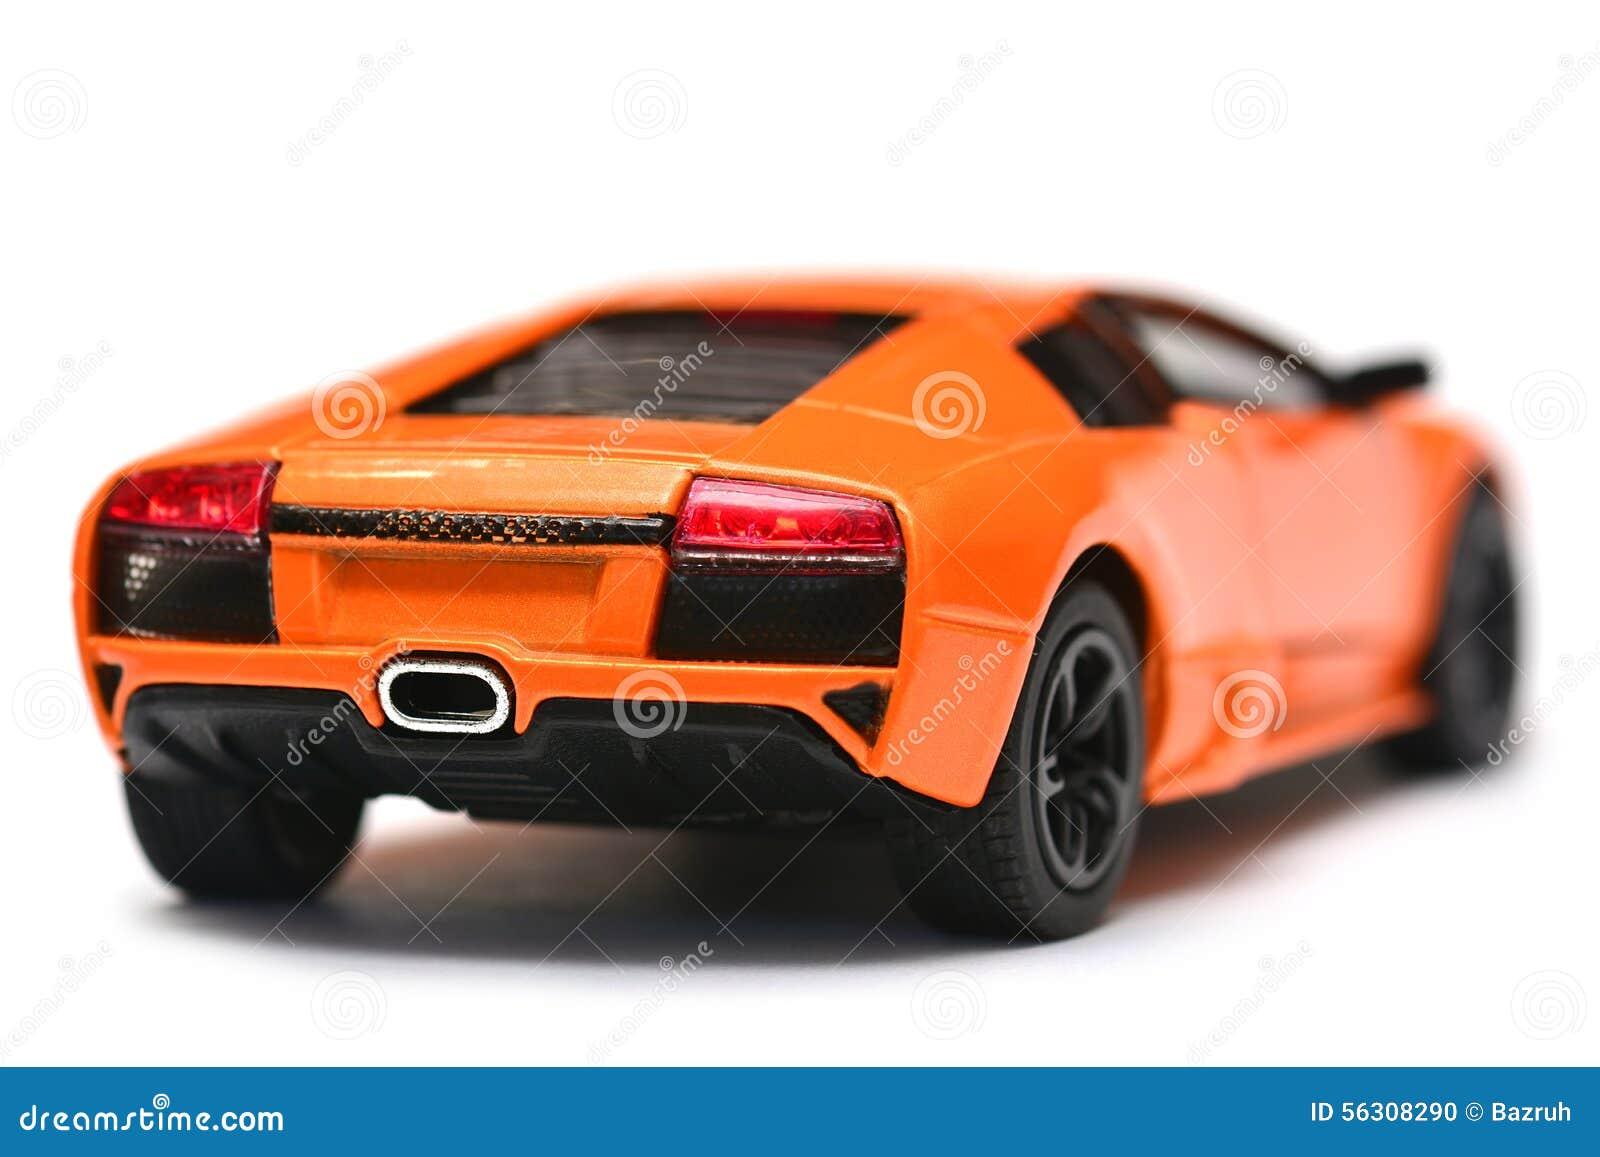 Car Models Lamborghini Murcielago Stock Photo Image Of Fuel